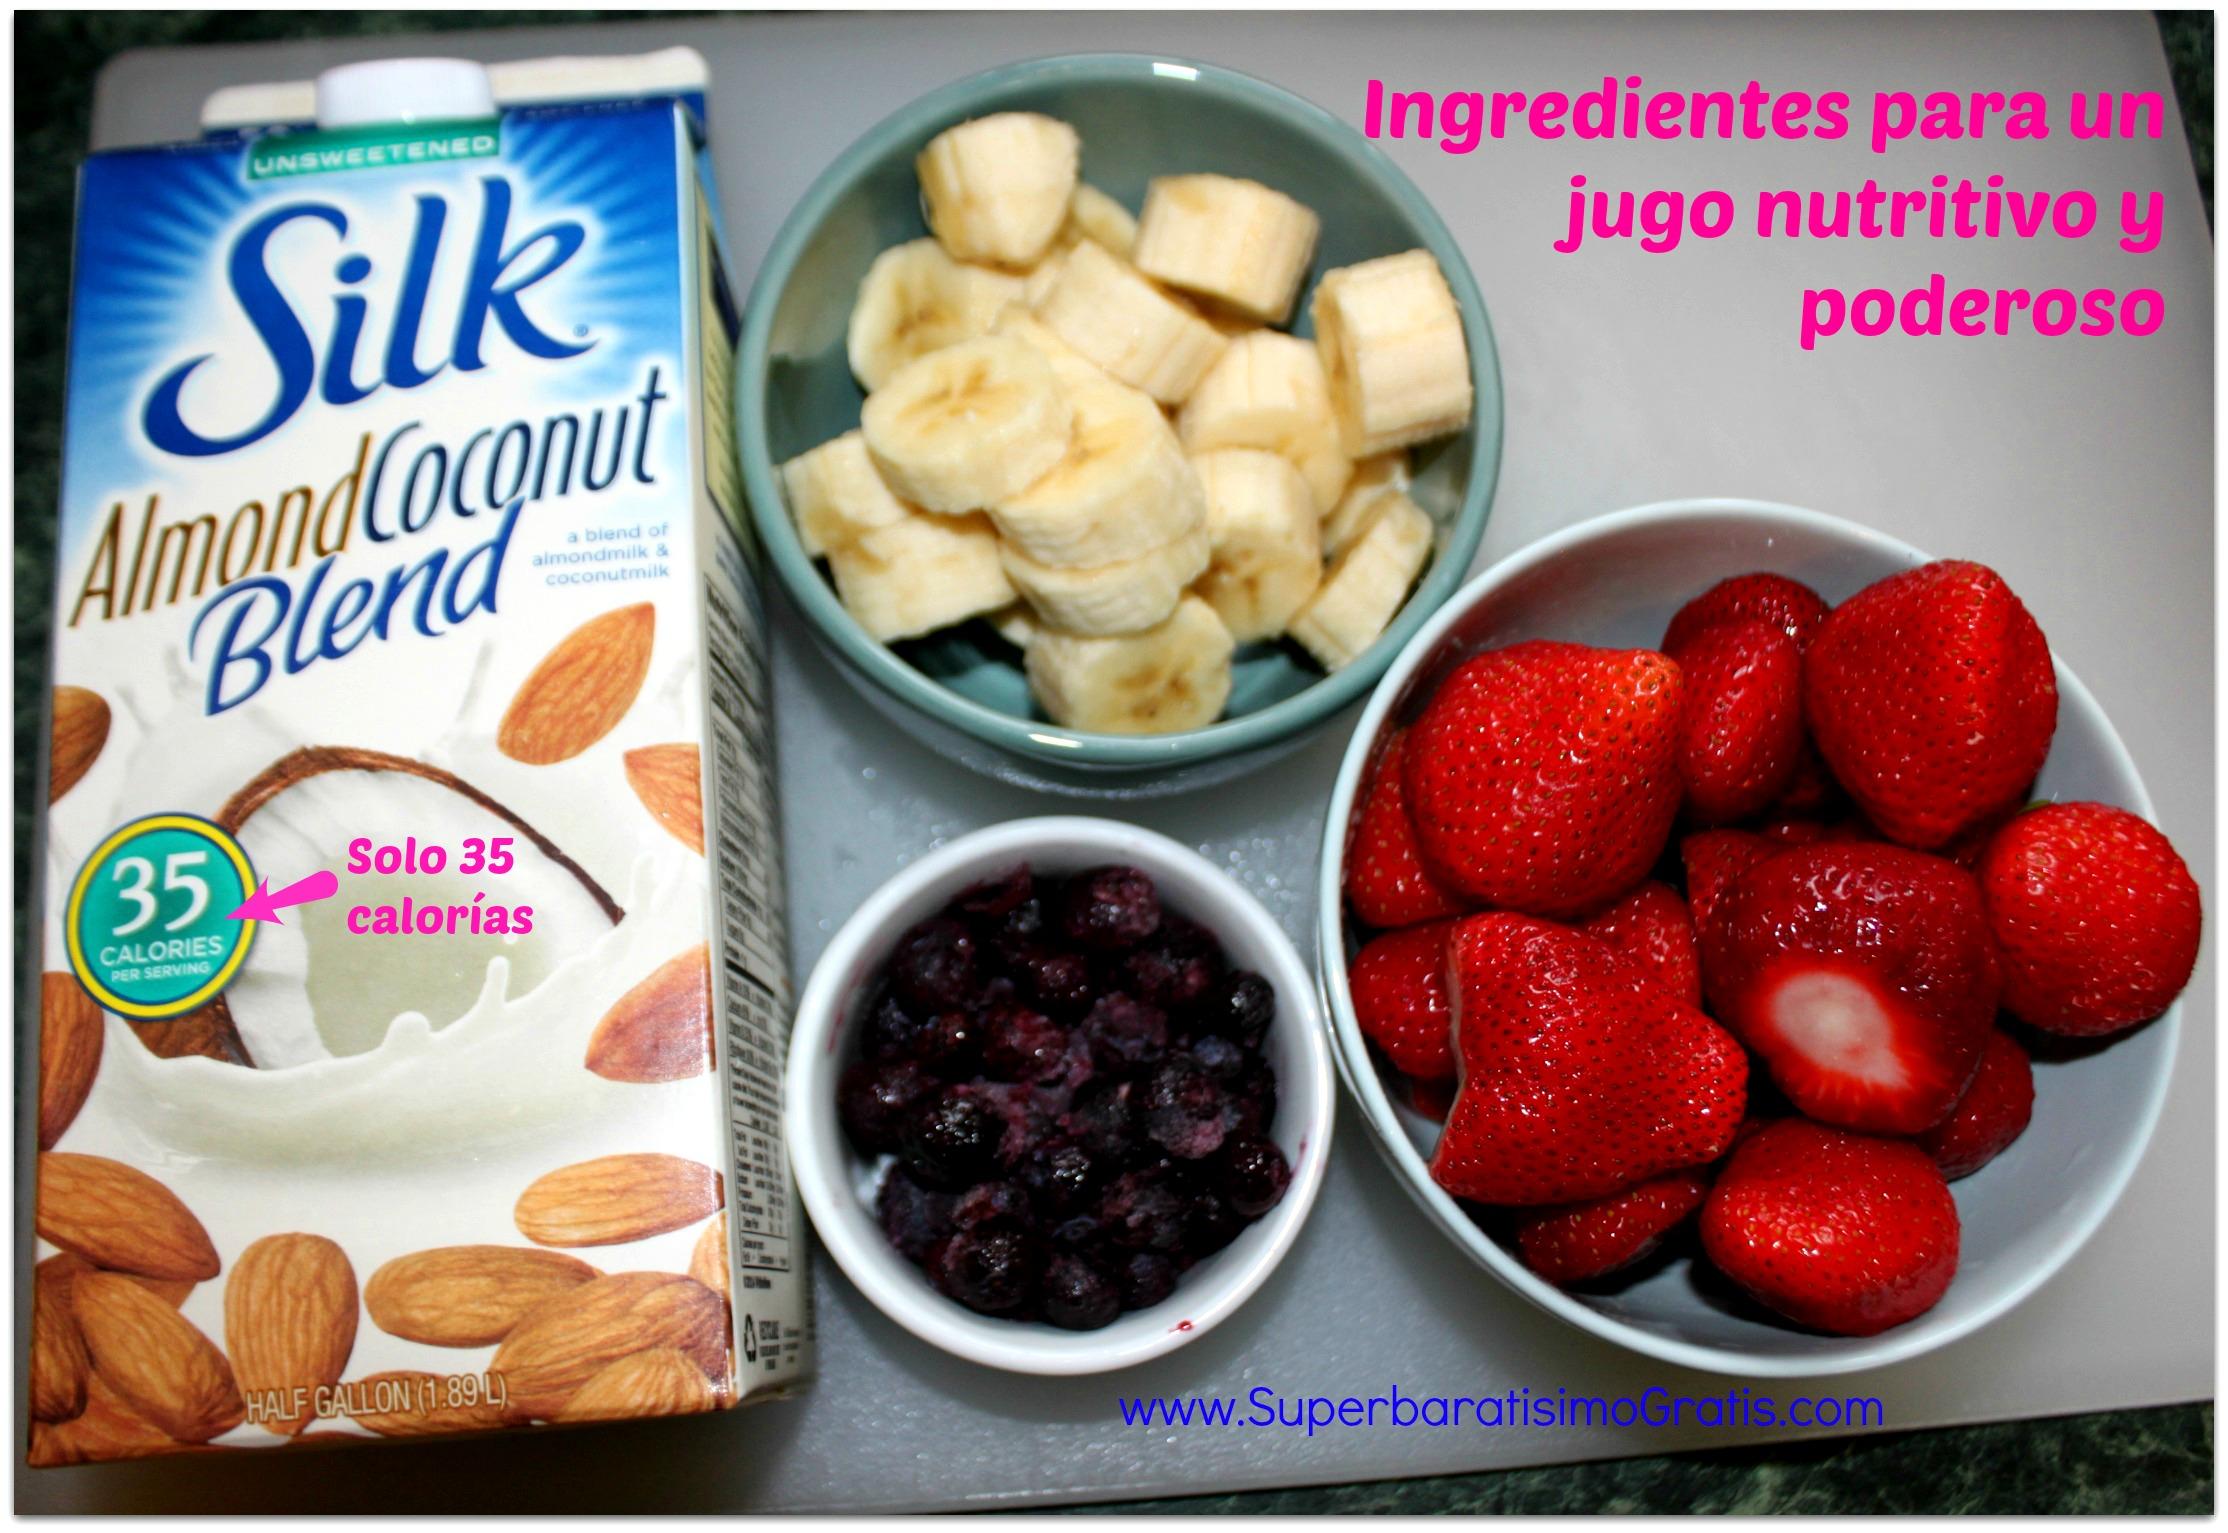 silk-almond-coconut-blend-receta-superbaratisimo1